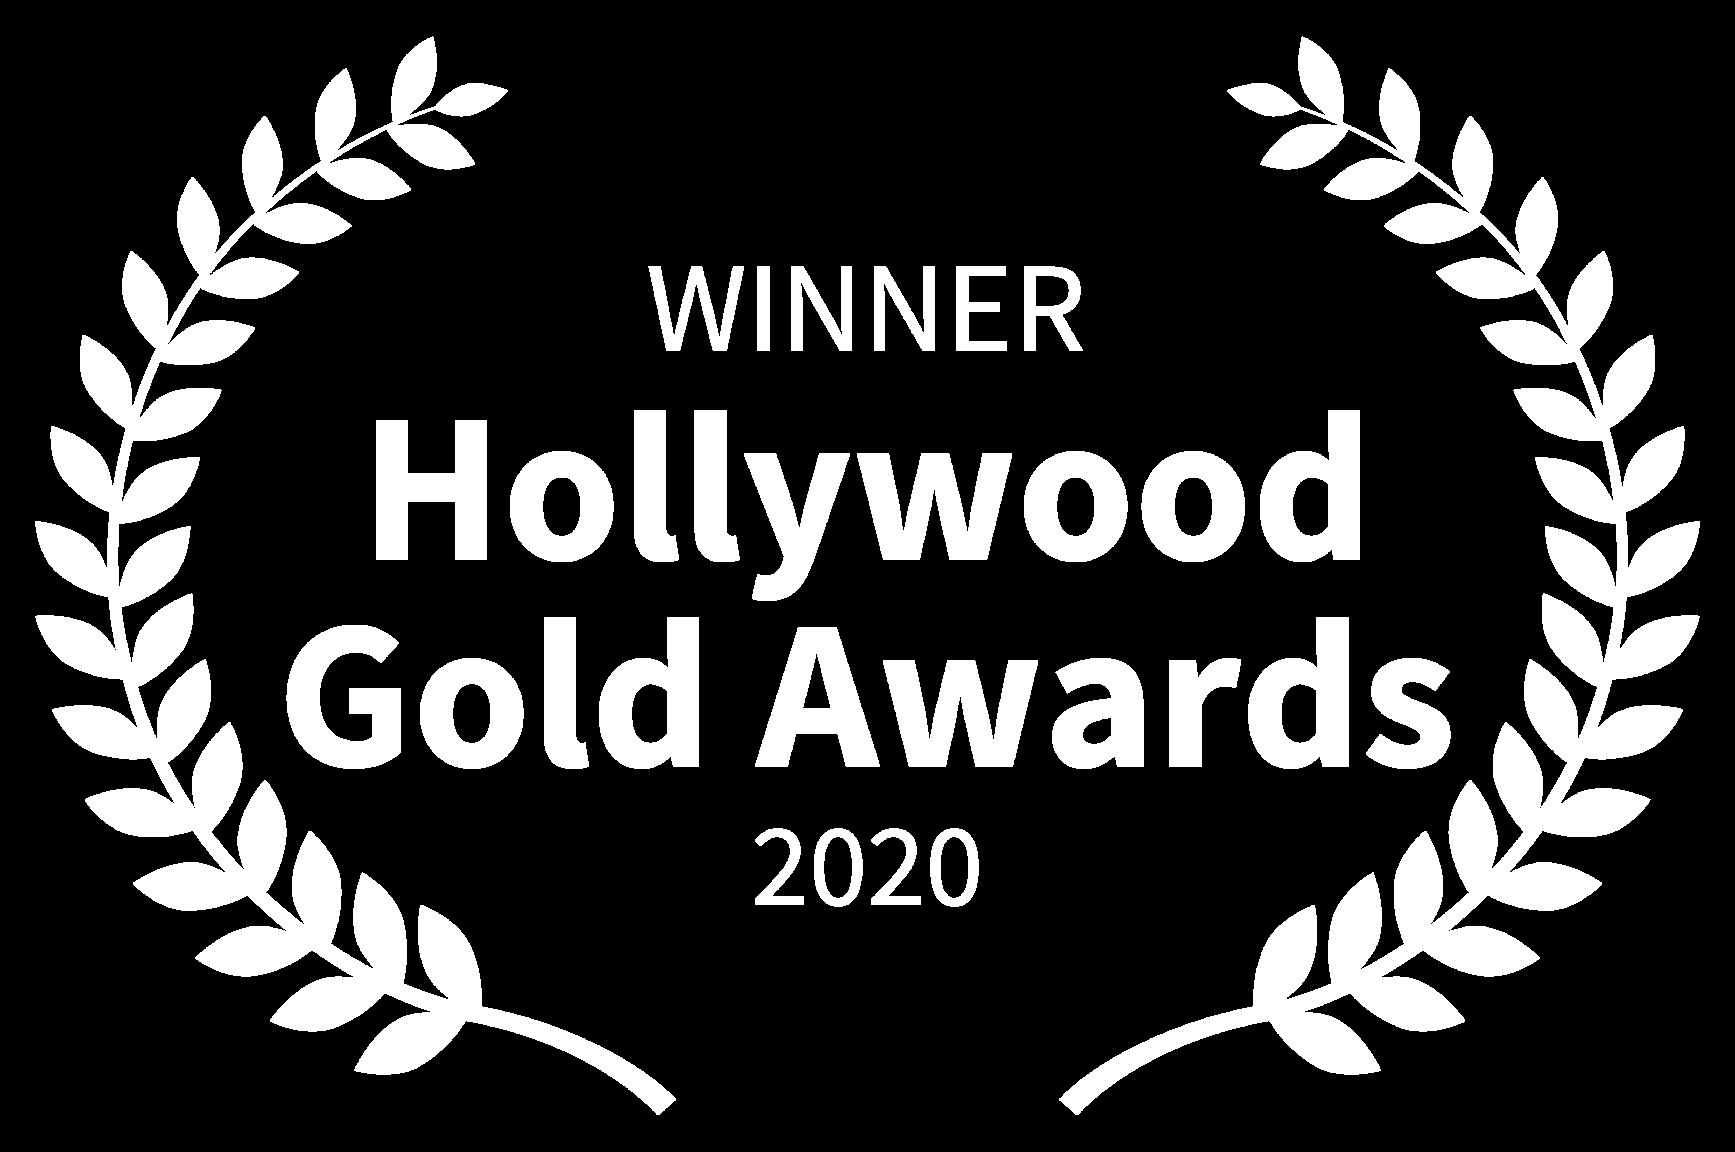 WINNER - Hollywood Gold Awards - 2020